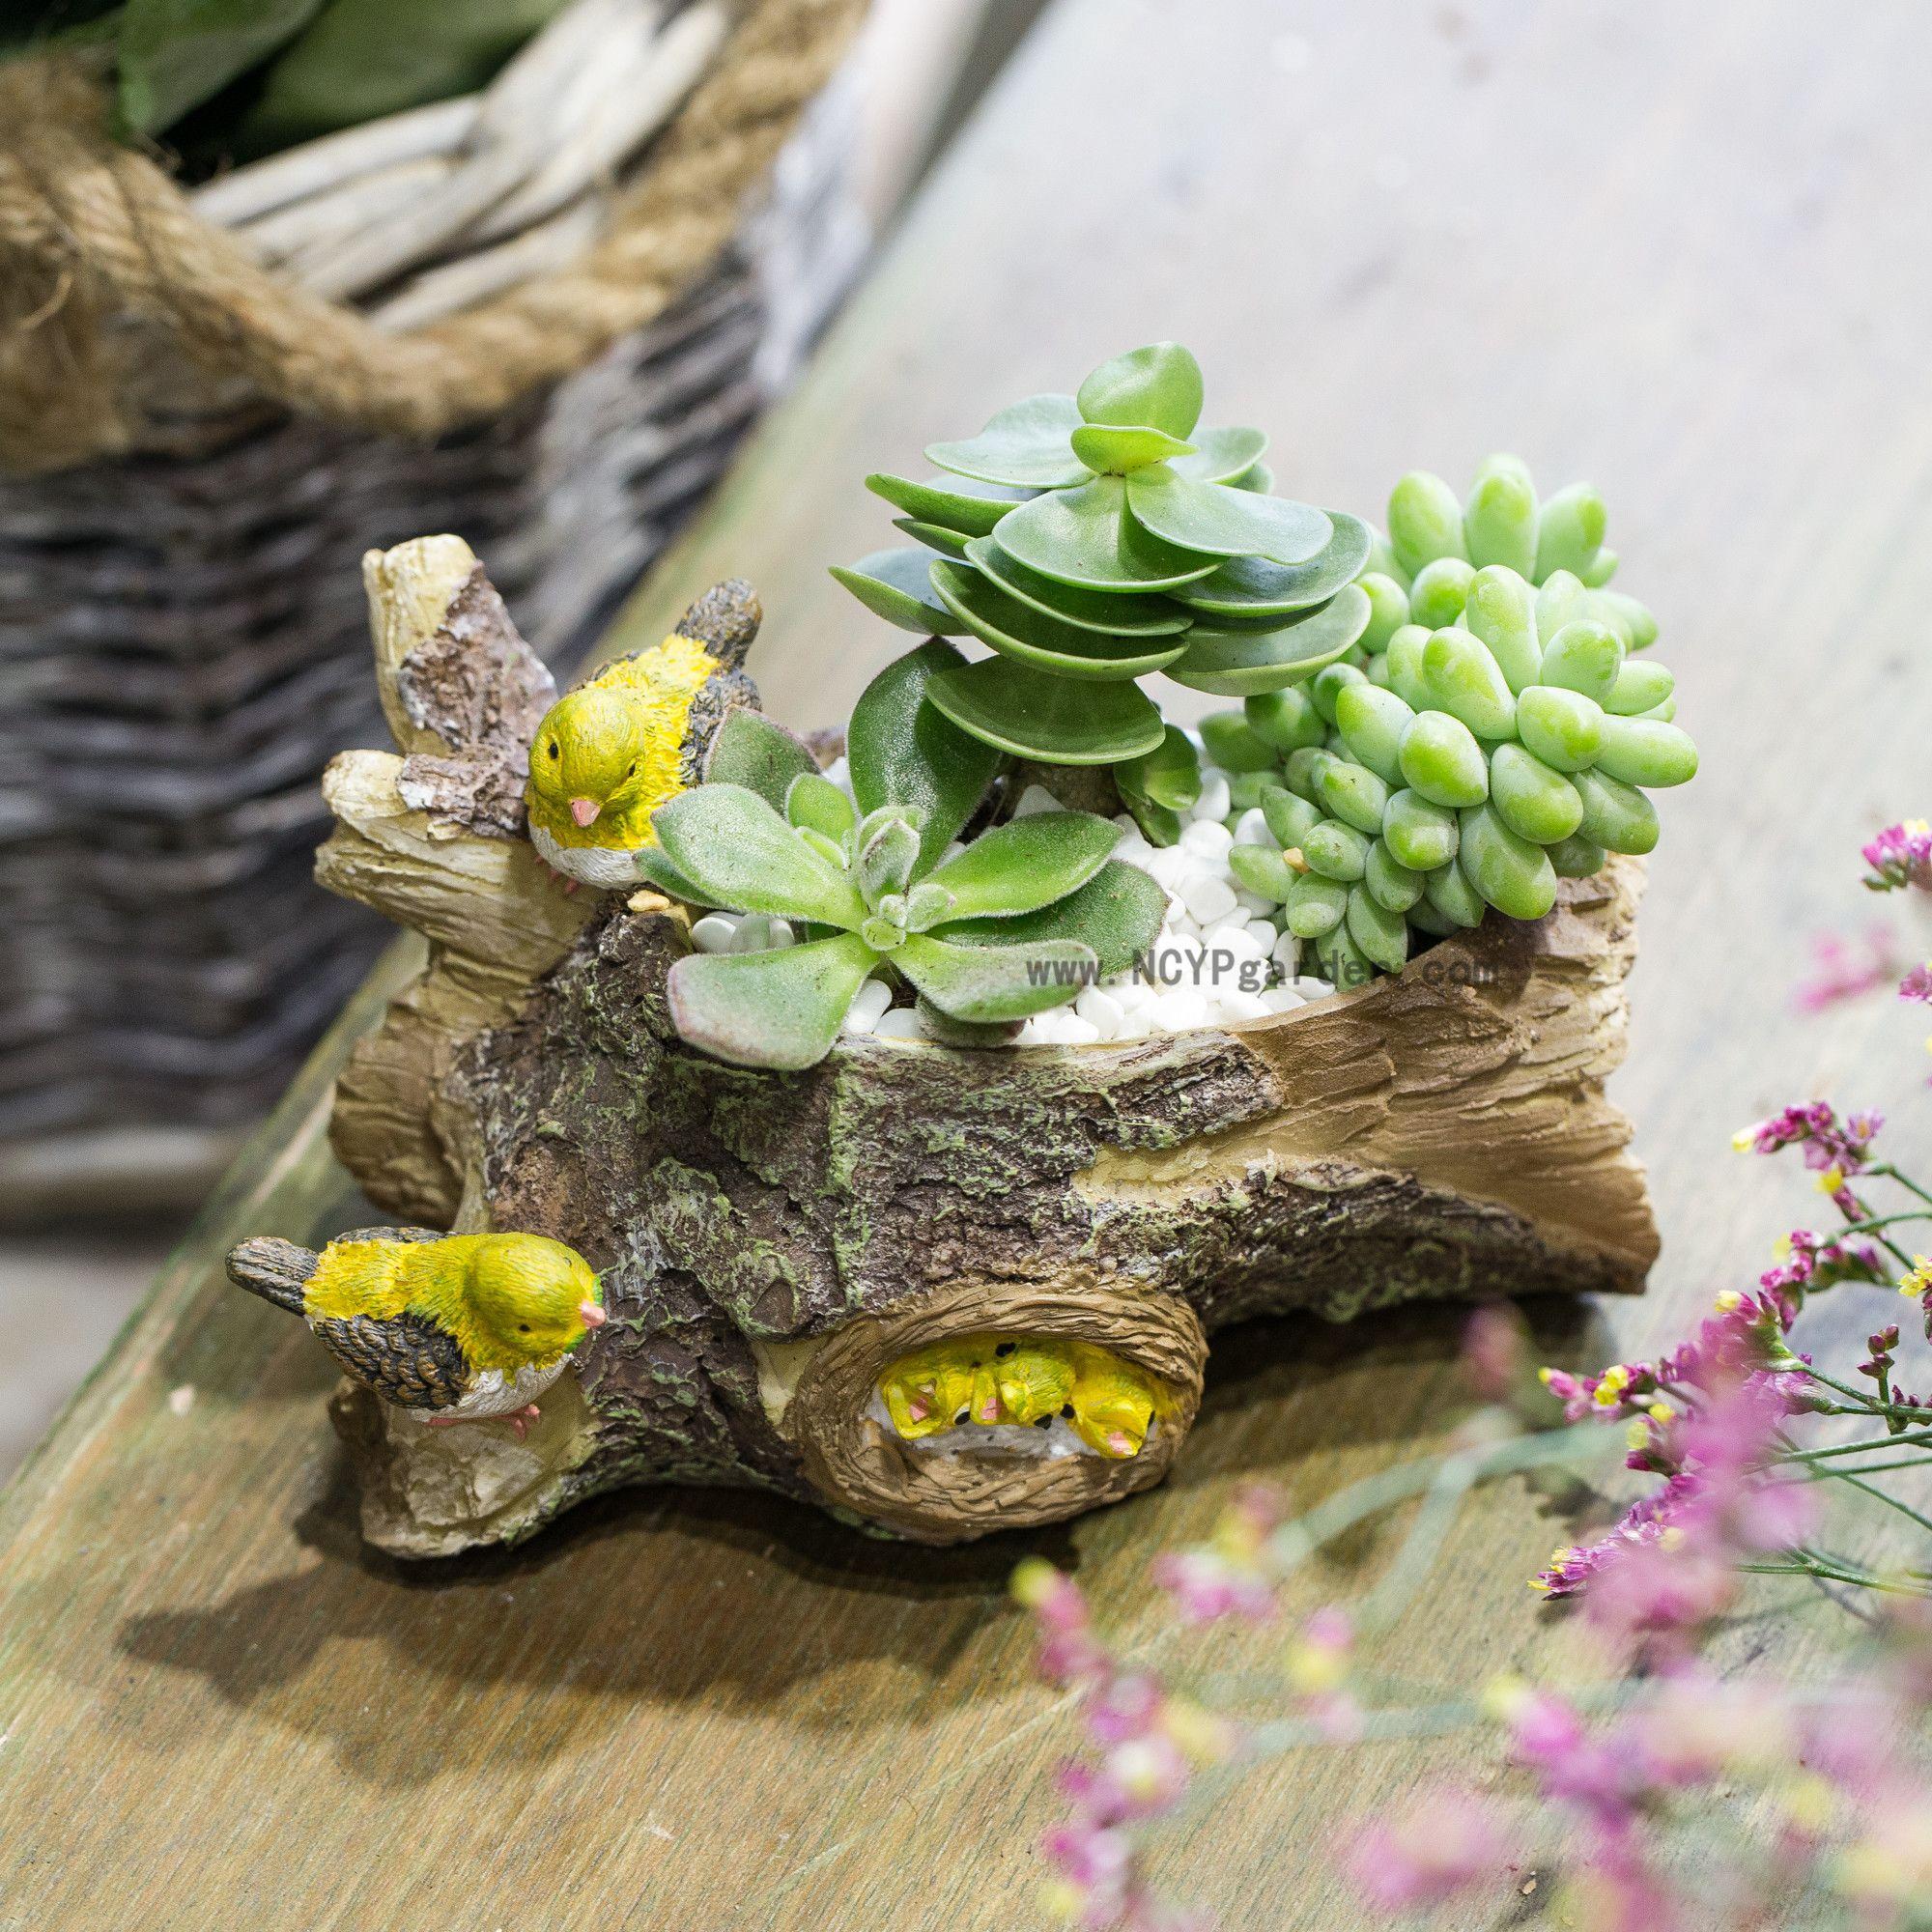 Bird And Timber Artificial Resin Flowers Succulent Plants Pot